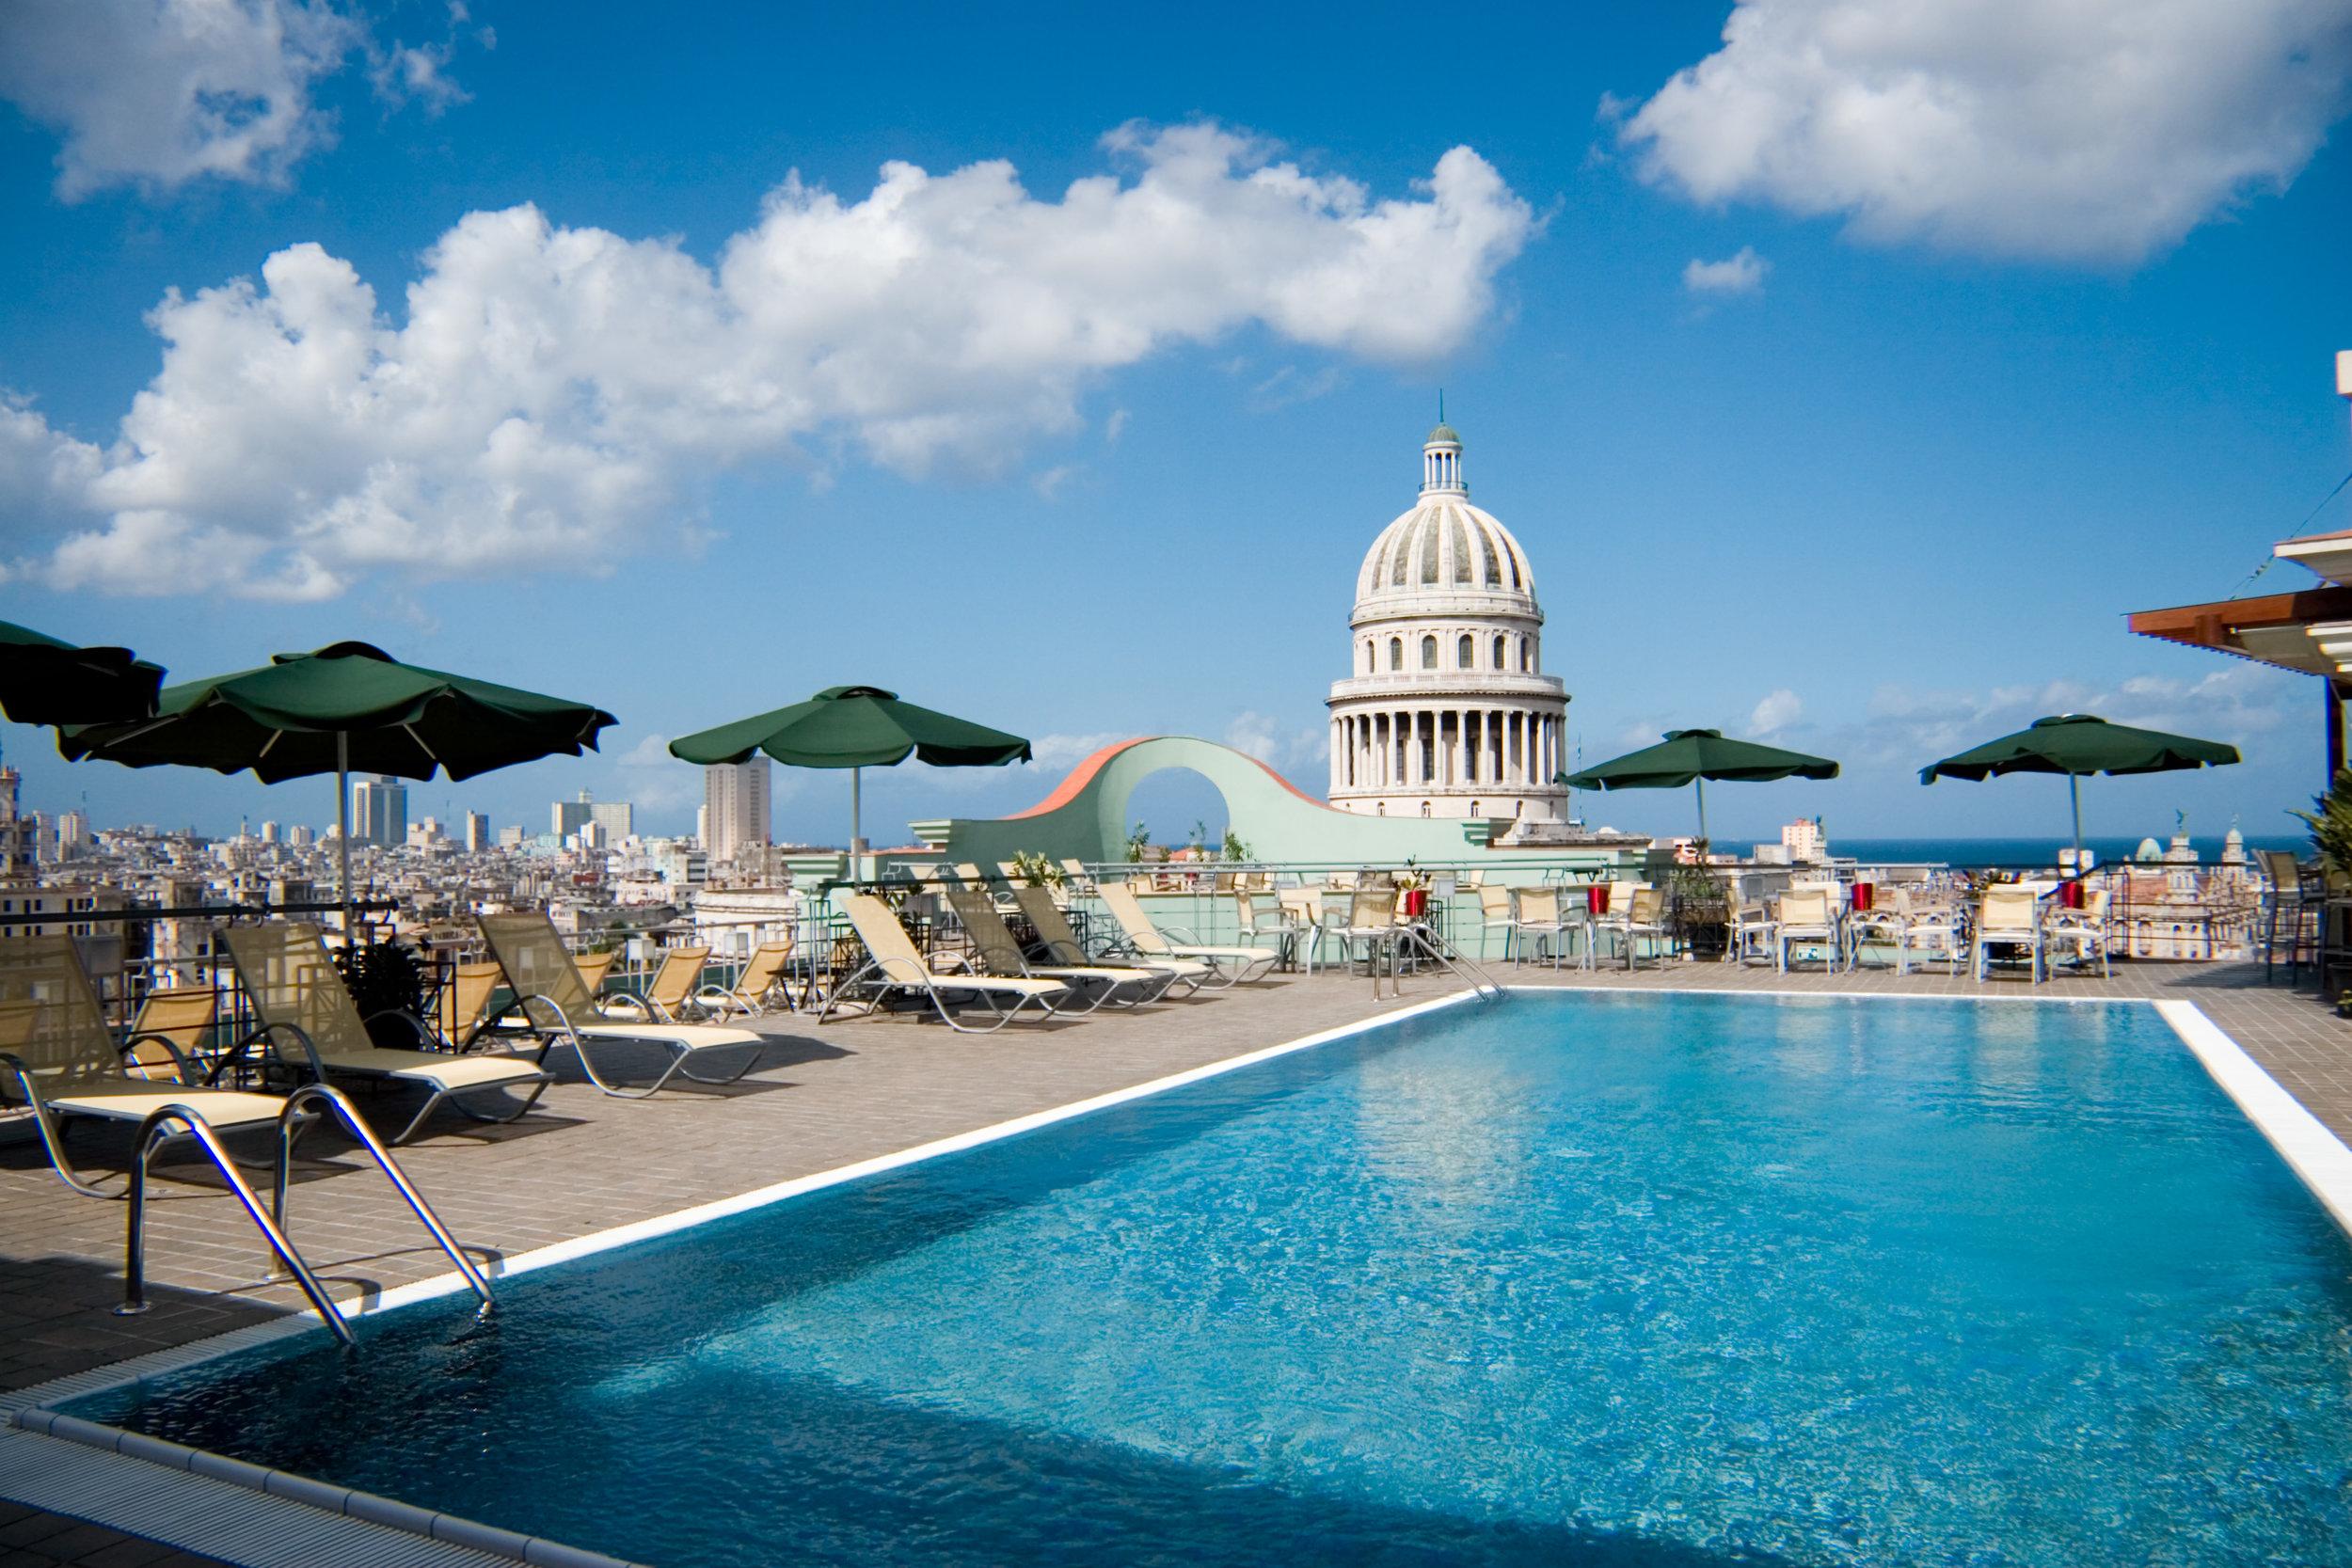 THE INGLATERRA HOTEL -